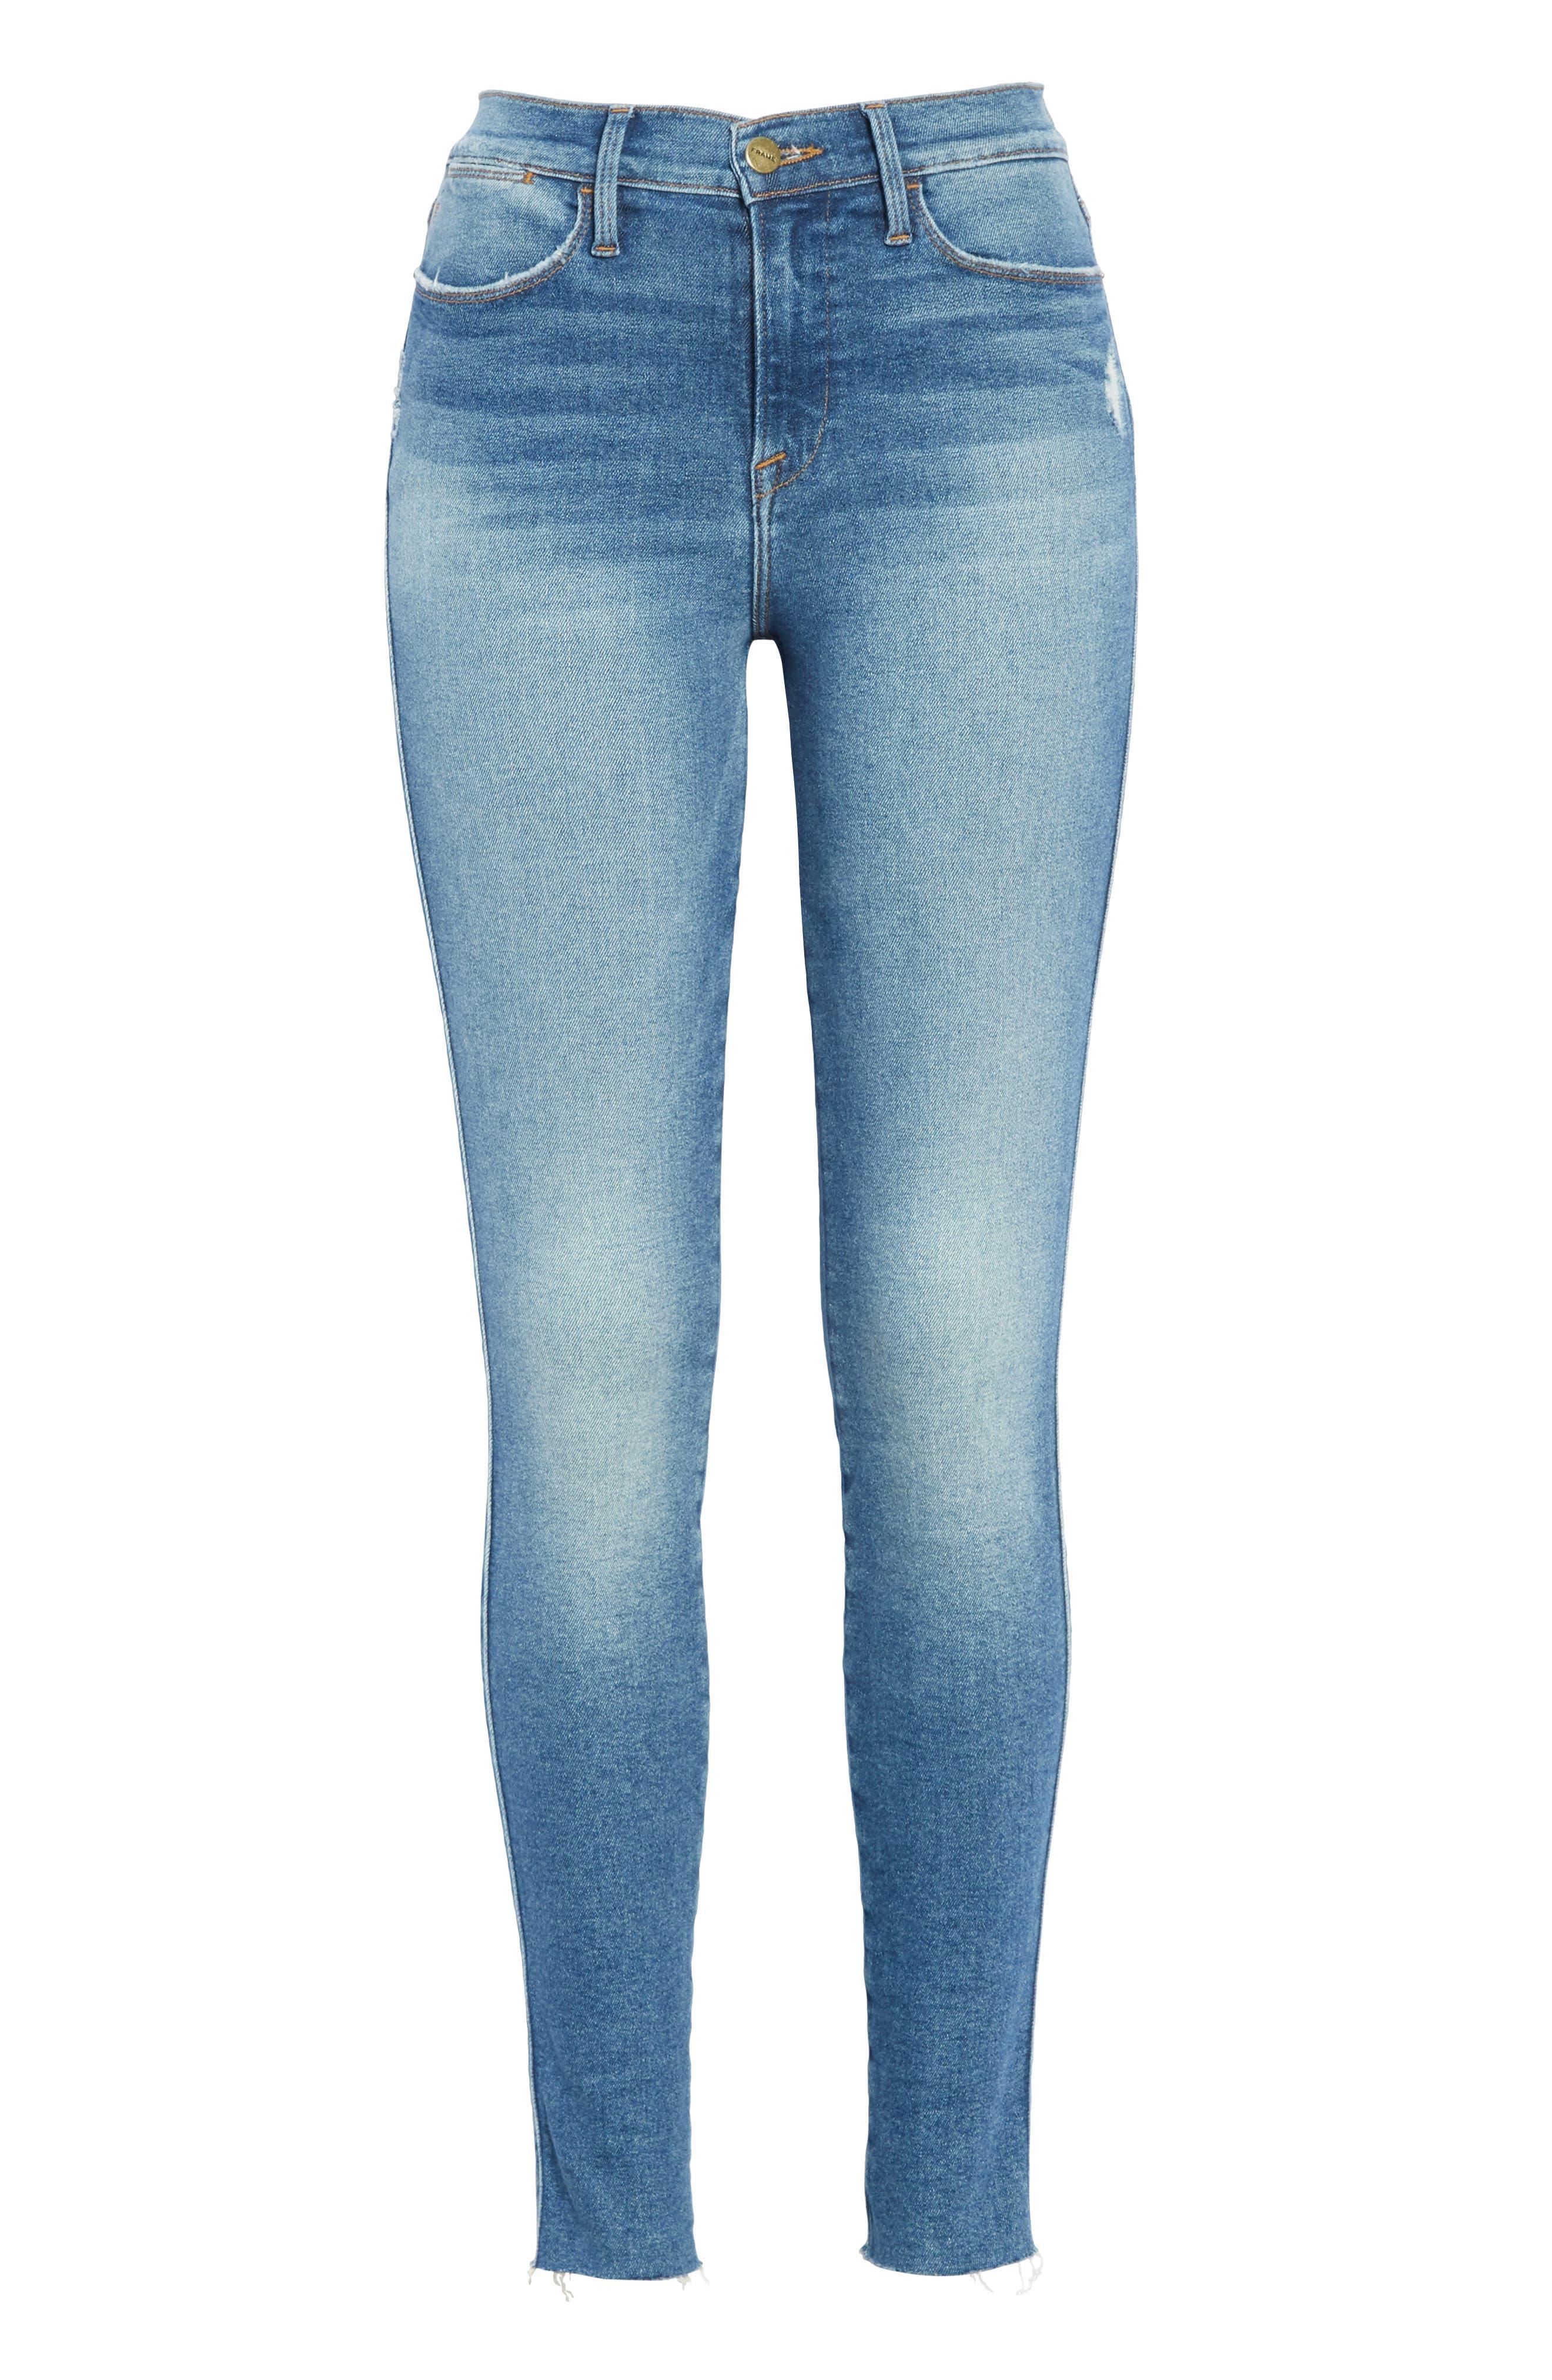 FRAME, Le Skinny de Jeanne High Waist Raw Hem Jeans, Alternate thumbnail 7, color, MCGRATH